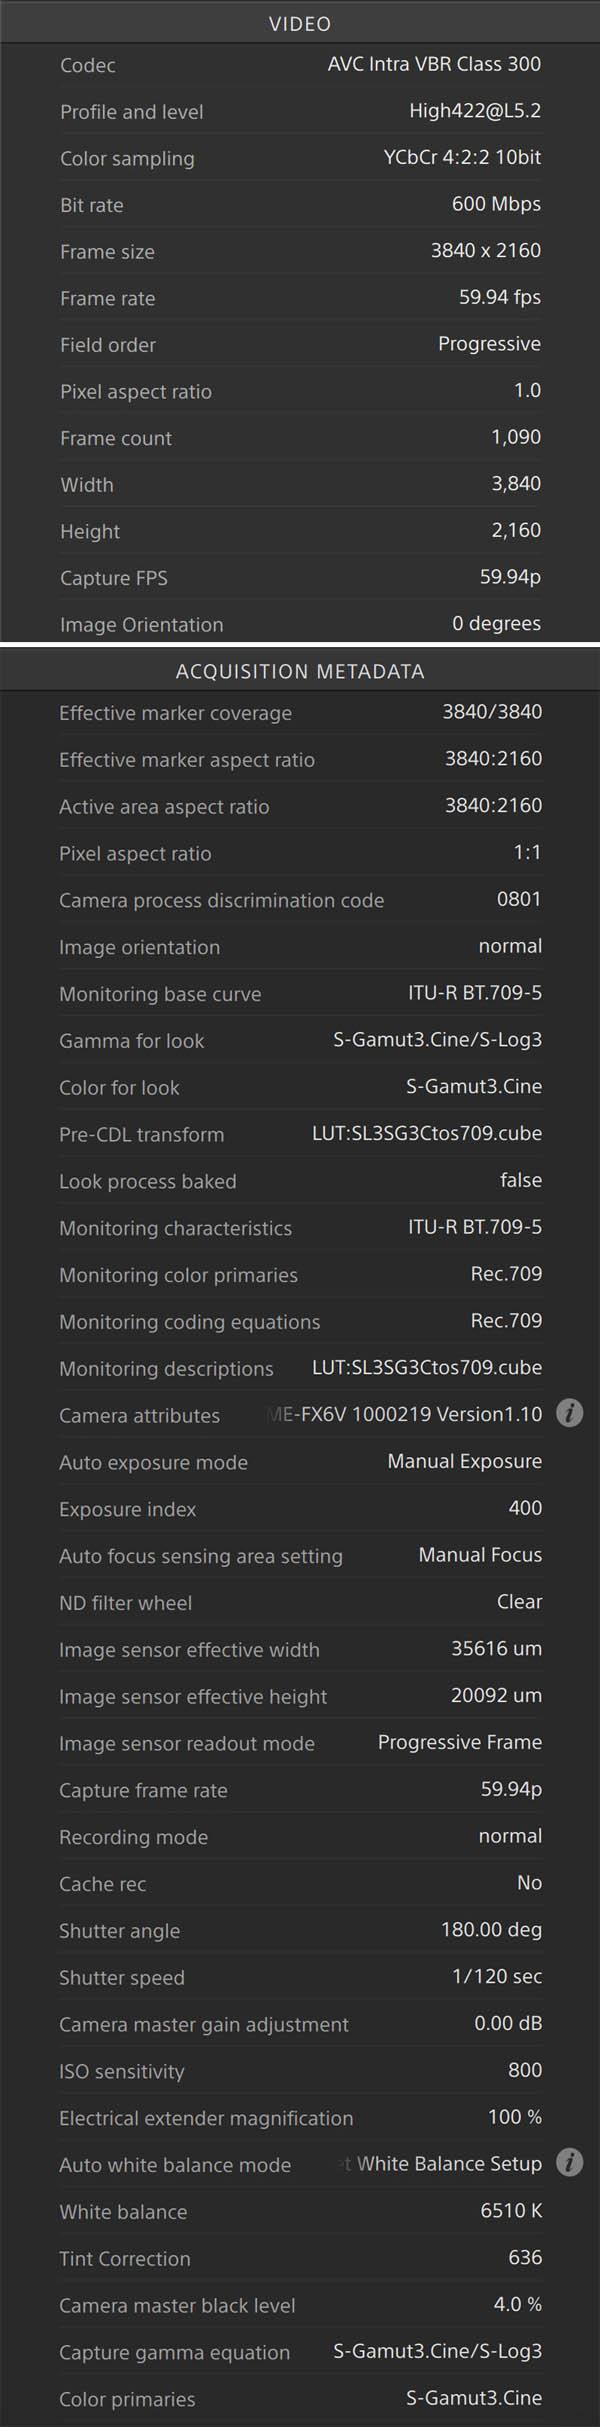 FX6_Catalyst_XAVC-I_VideoMetadata.jpg